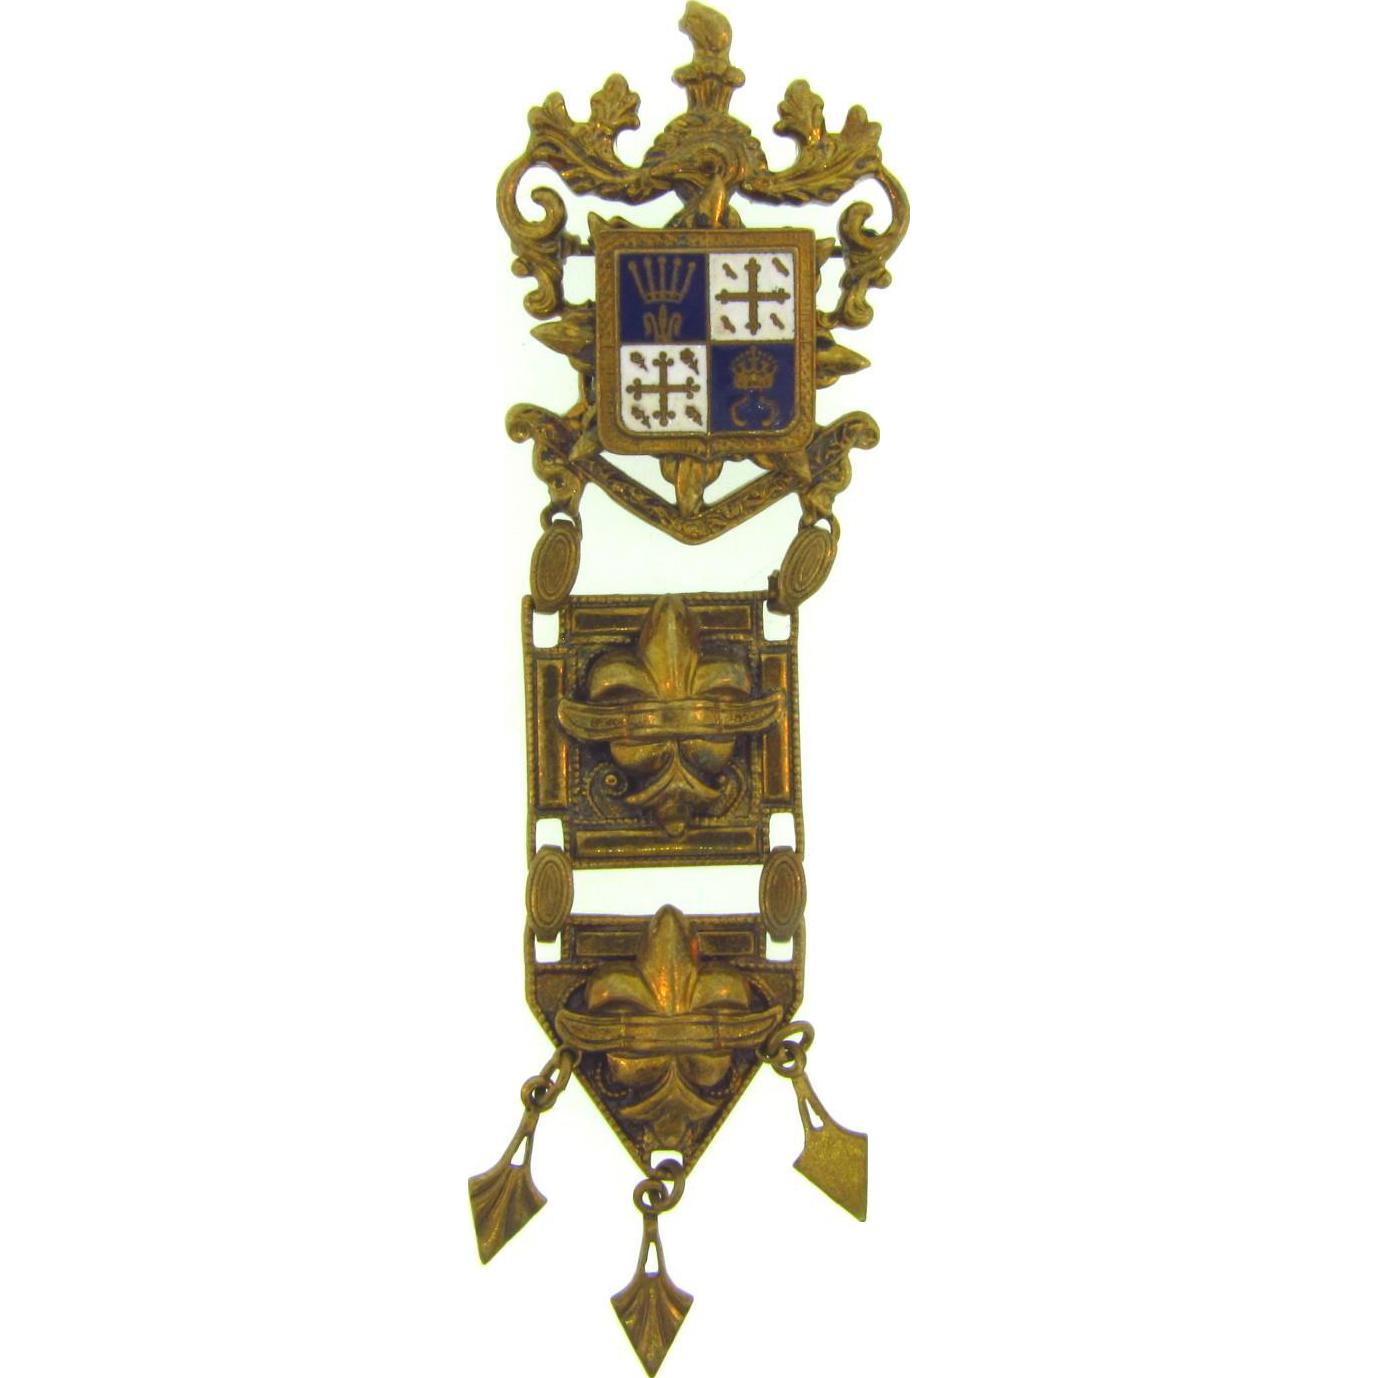 Unique vintage Brooch in a military medal design